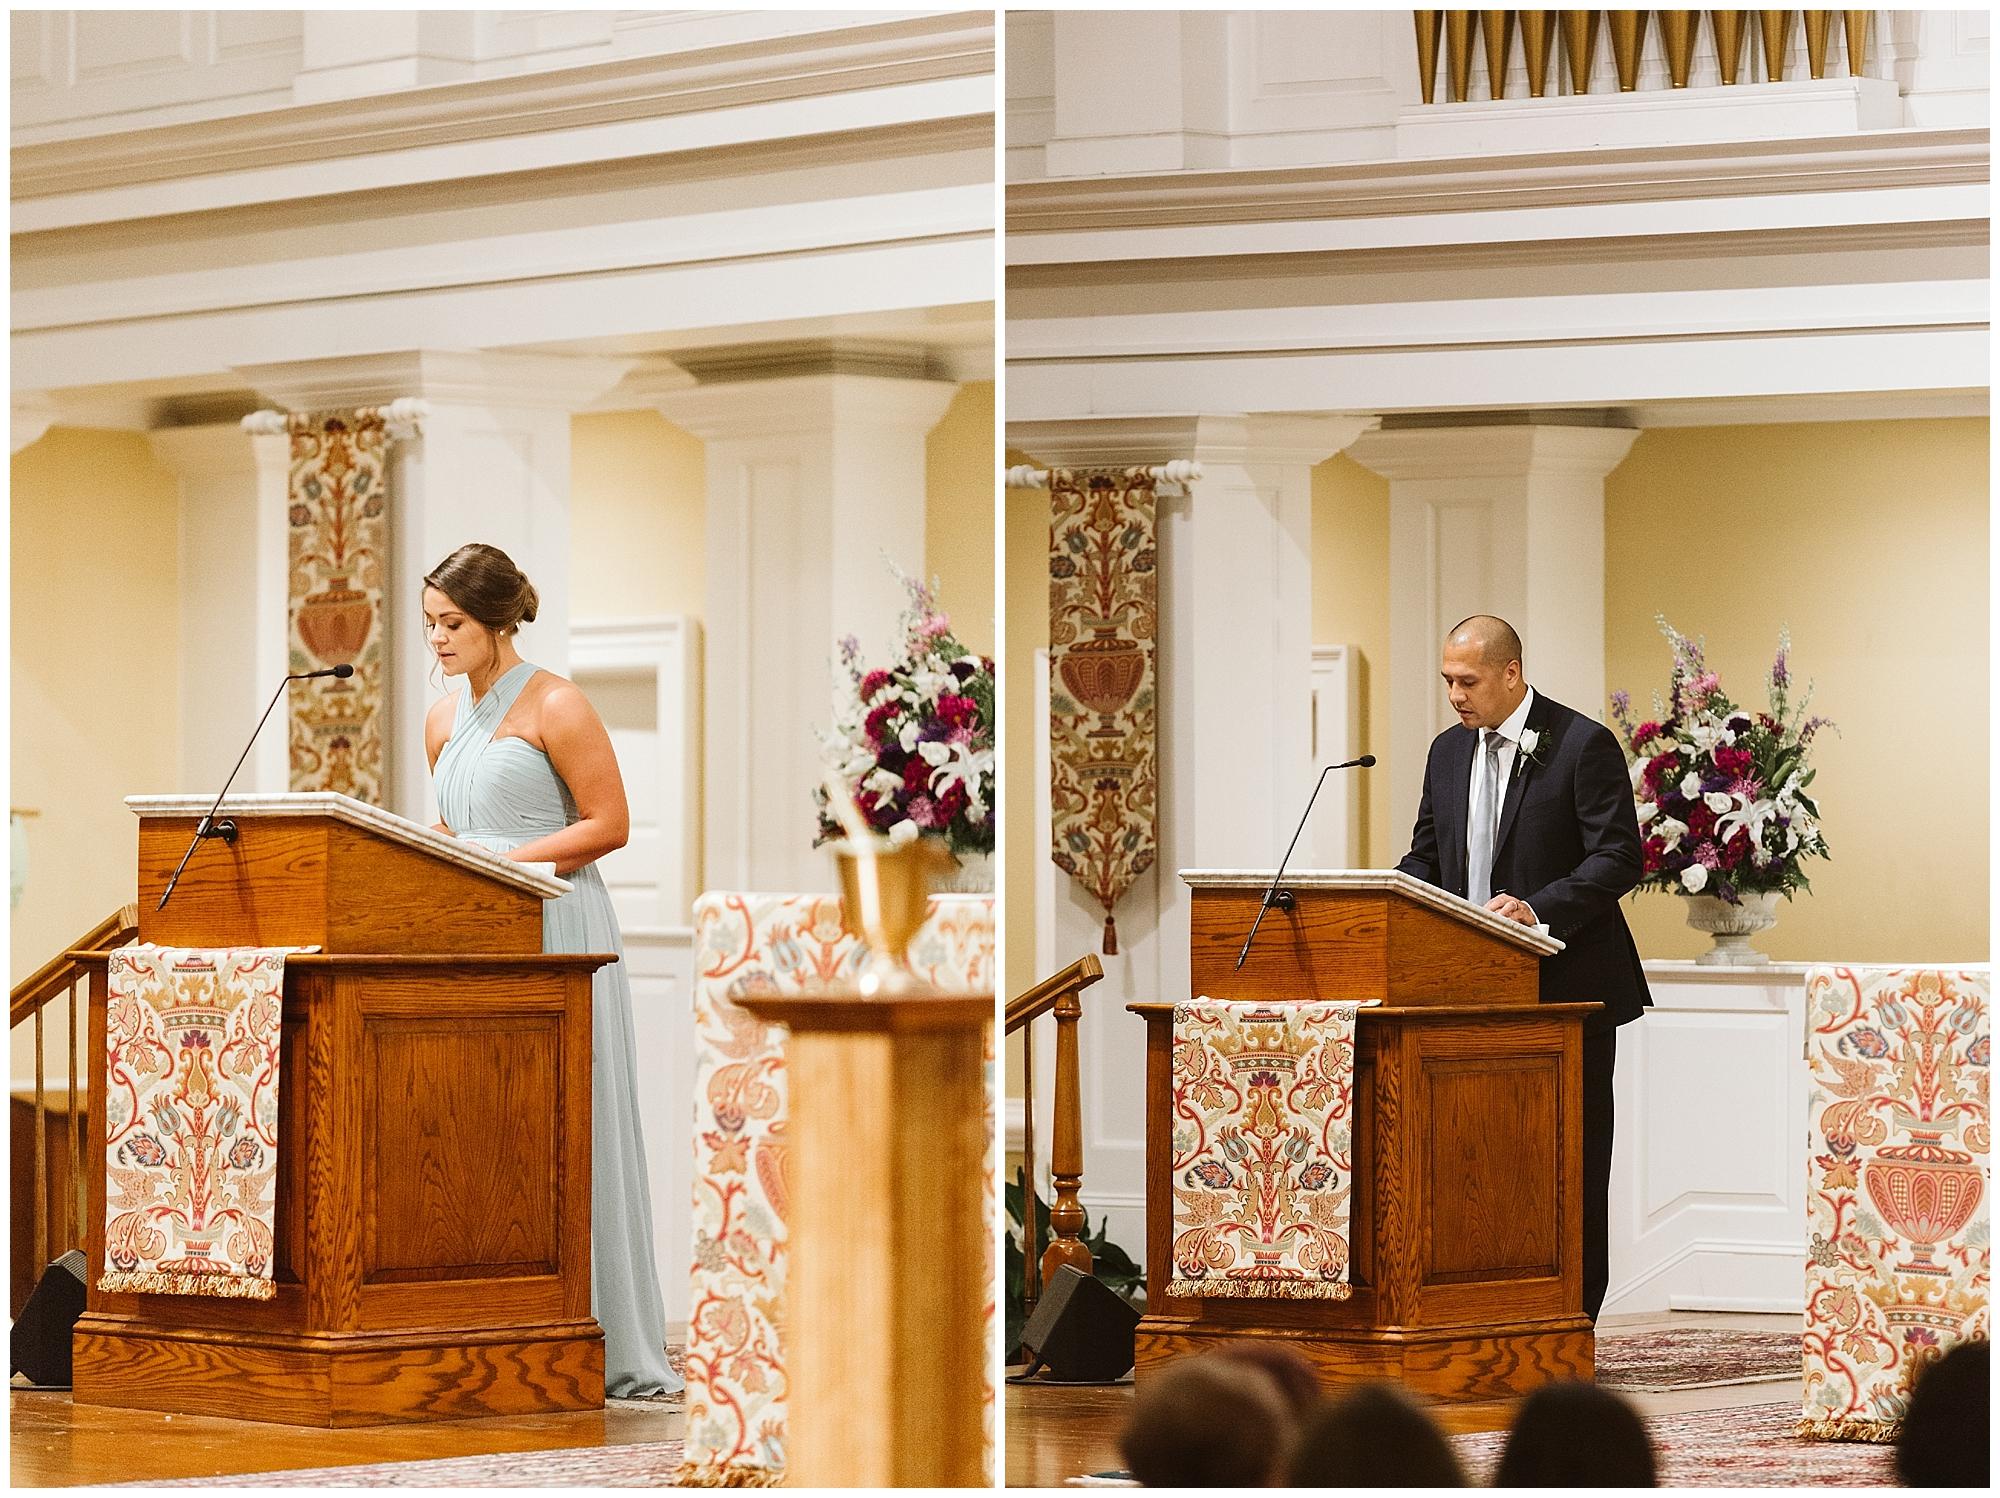 Oaks-at-salem-wedding-apex-photography-60.jpg